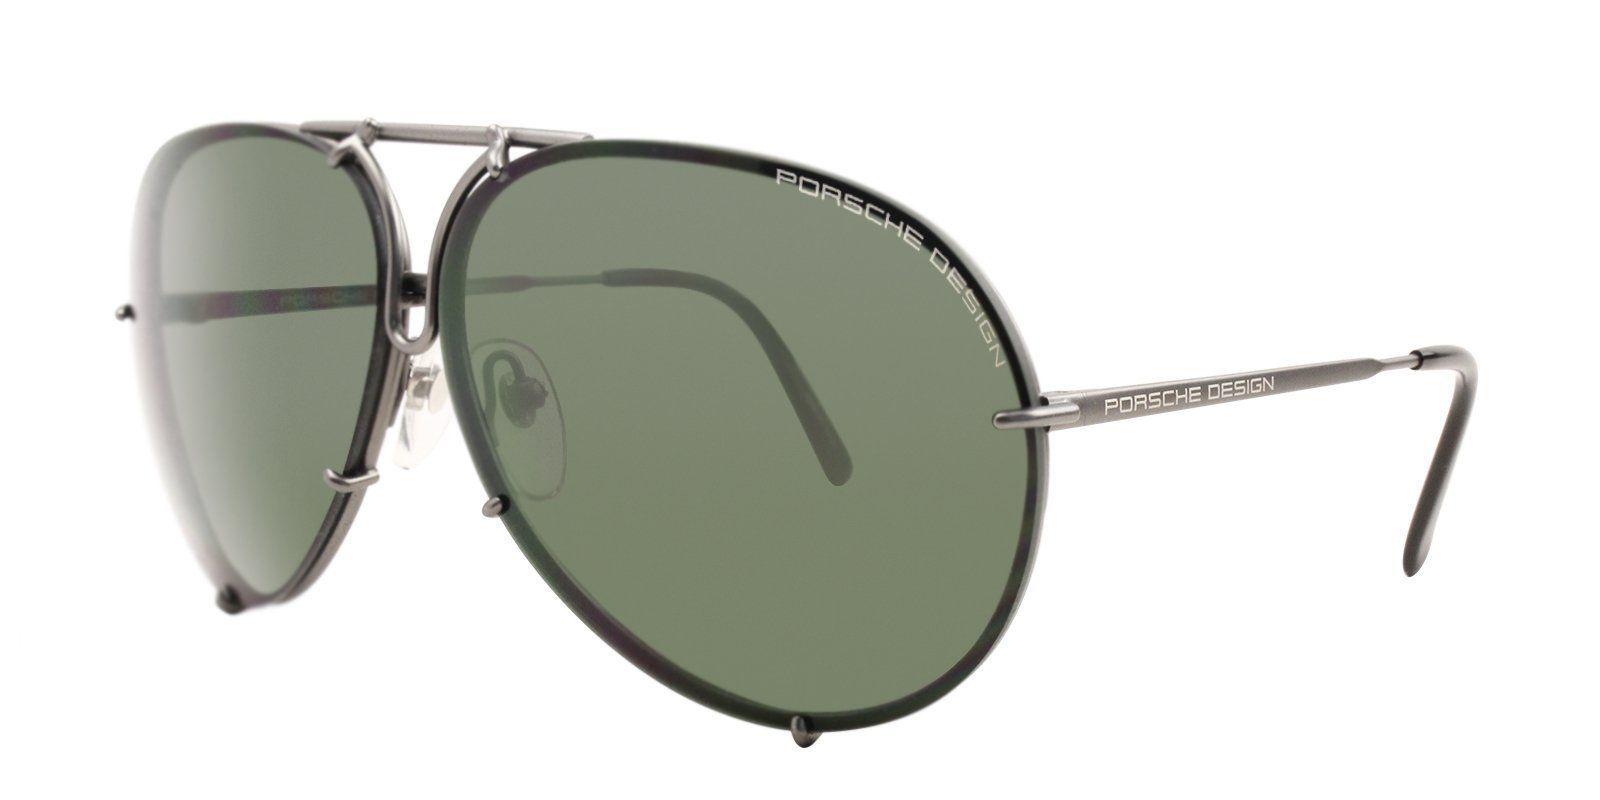 14dfeb1beb Porsche Design - P8478 Gray - Green-sunglasses-Designer Eyes ...